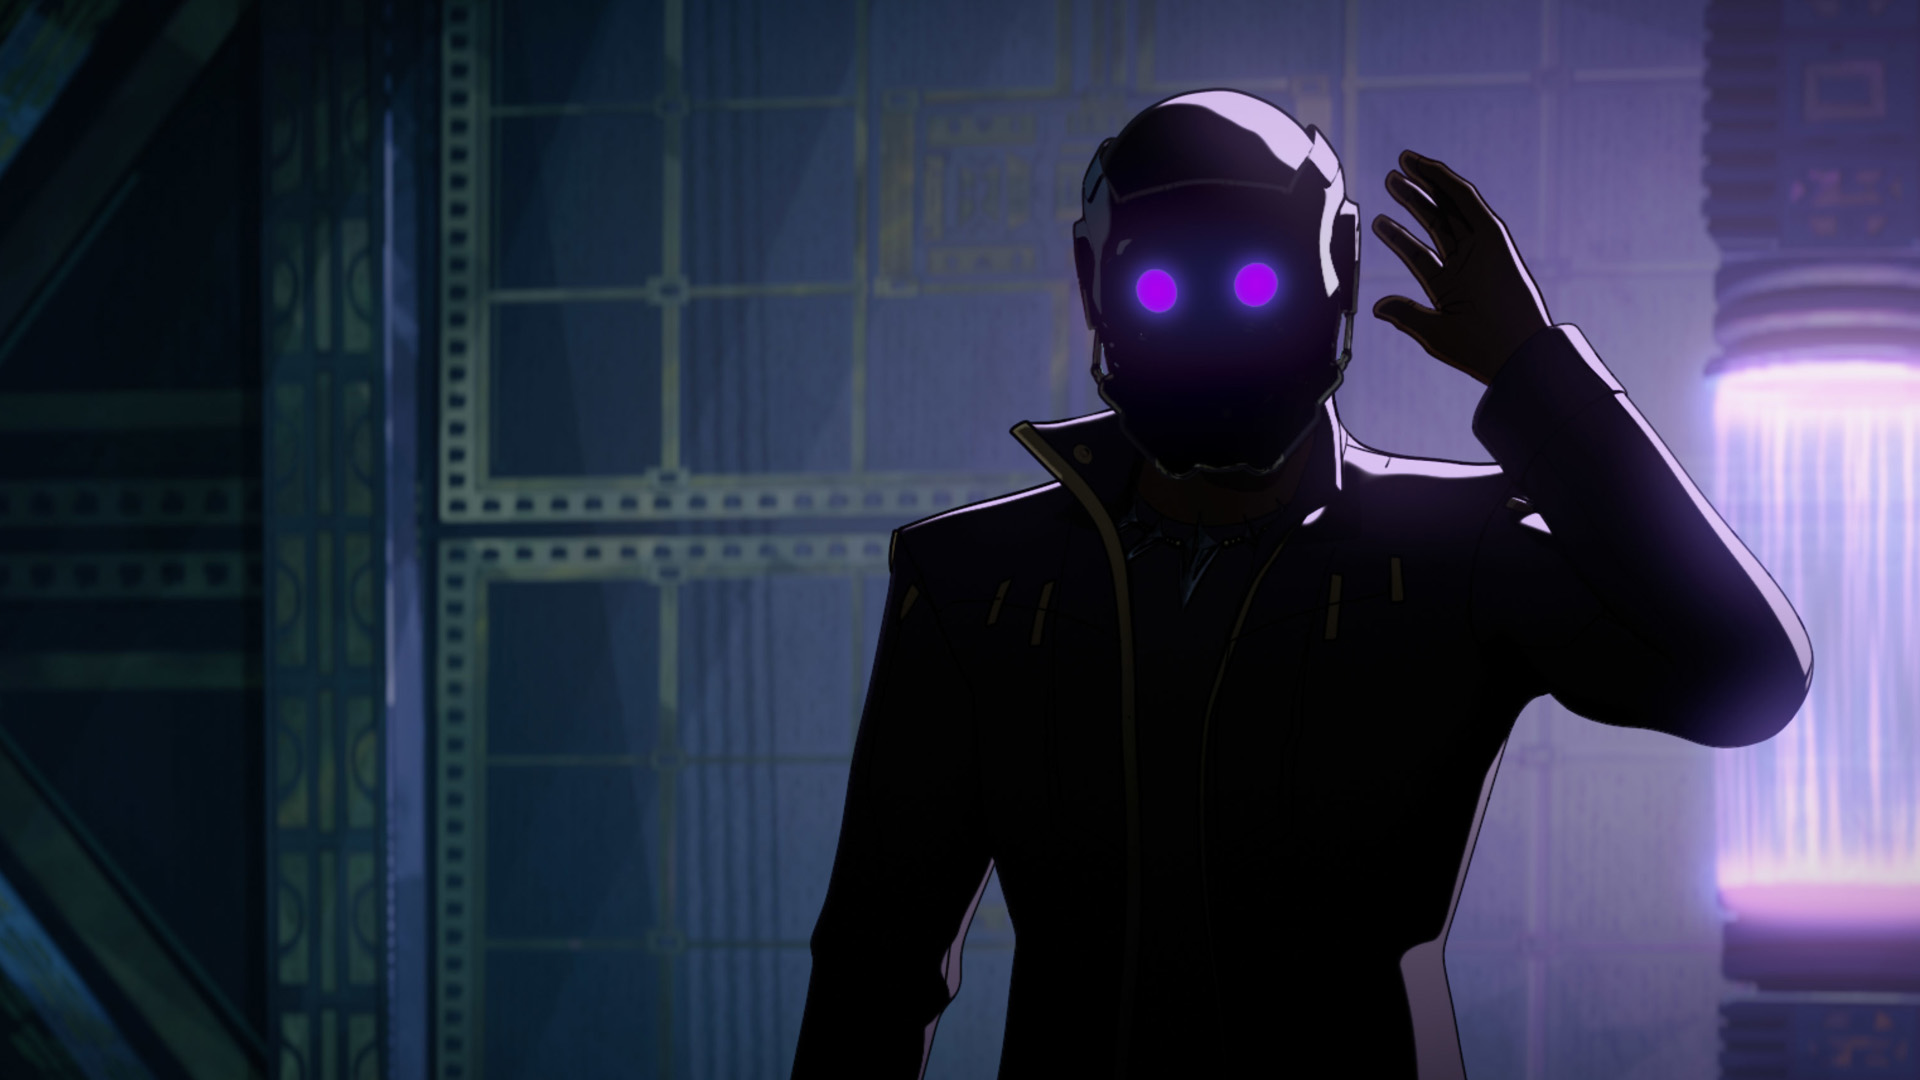 Chadwick Boseman como T'Challa Star Lord en ¿Y si ...?  episodio 2